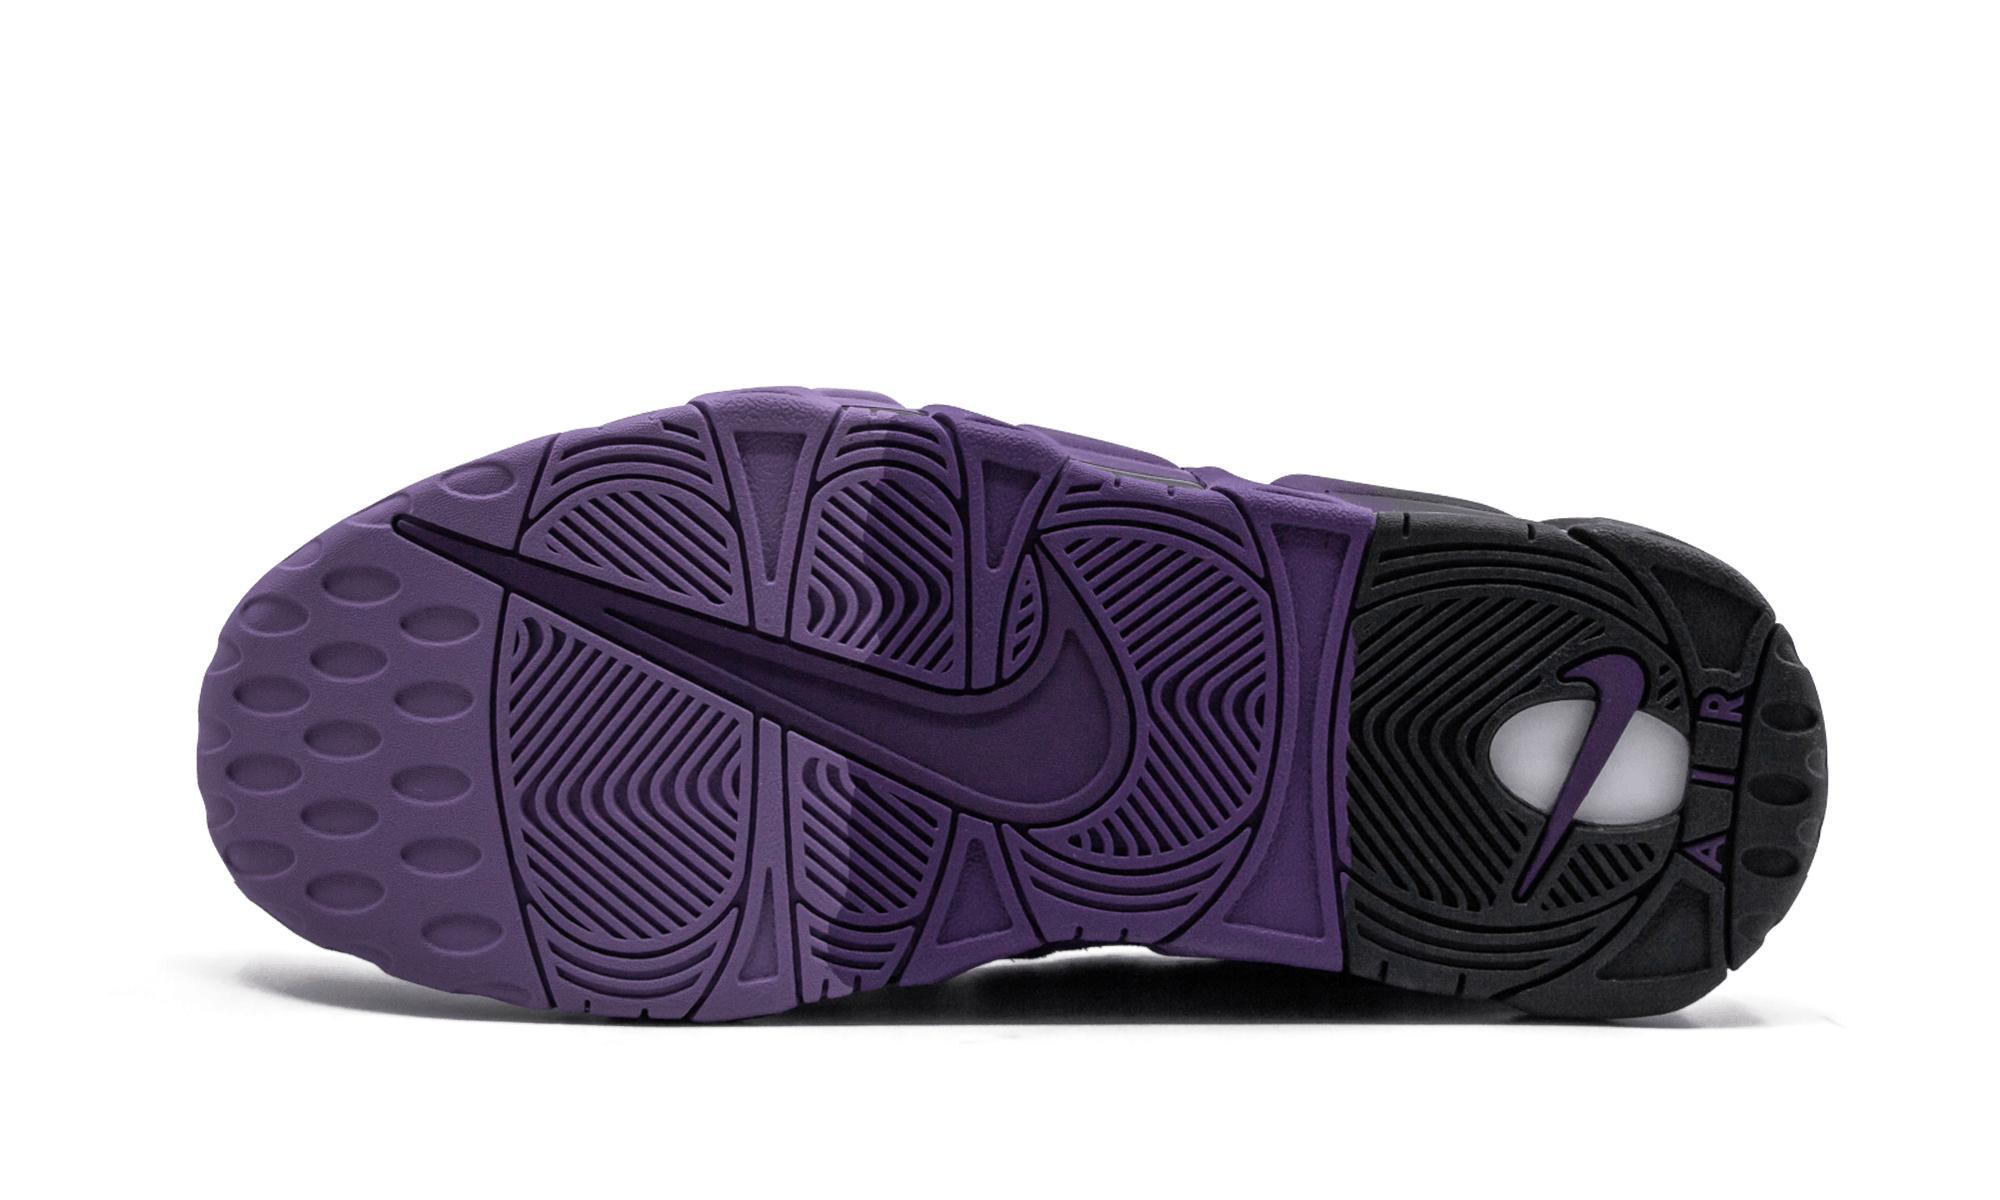 official photos 7445d 3a723 Nike - Purple Air More Money Qs Prpl for Men - Lyst. View fullscreen